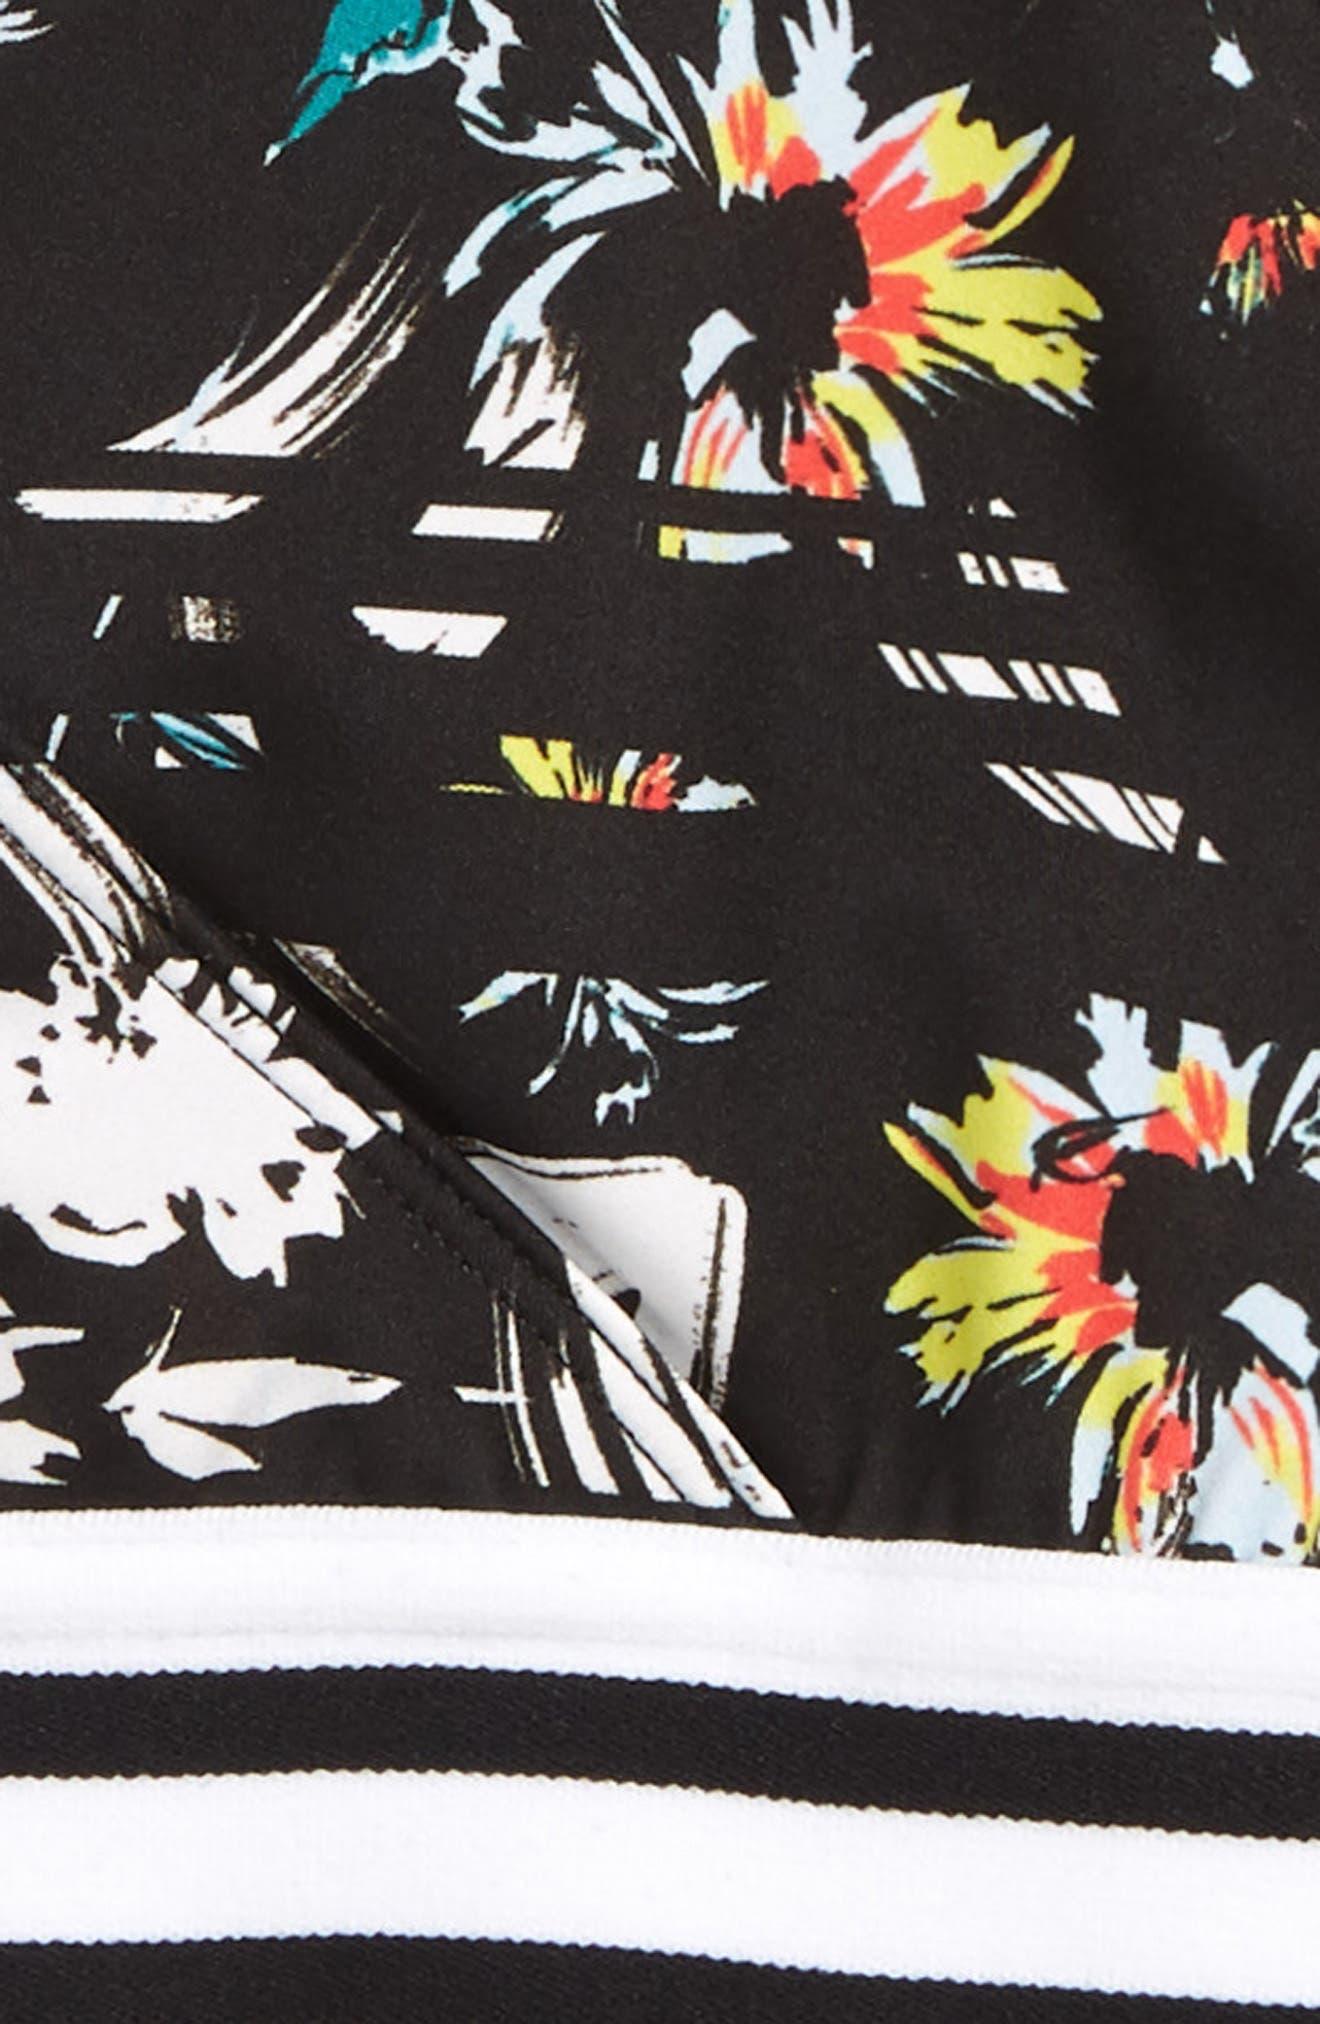 Retro Two-Piece Swimsuit,                             Alternate thumbnail 2, color,                             BLACK MULTI SPLICED FLORAL